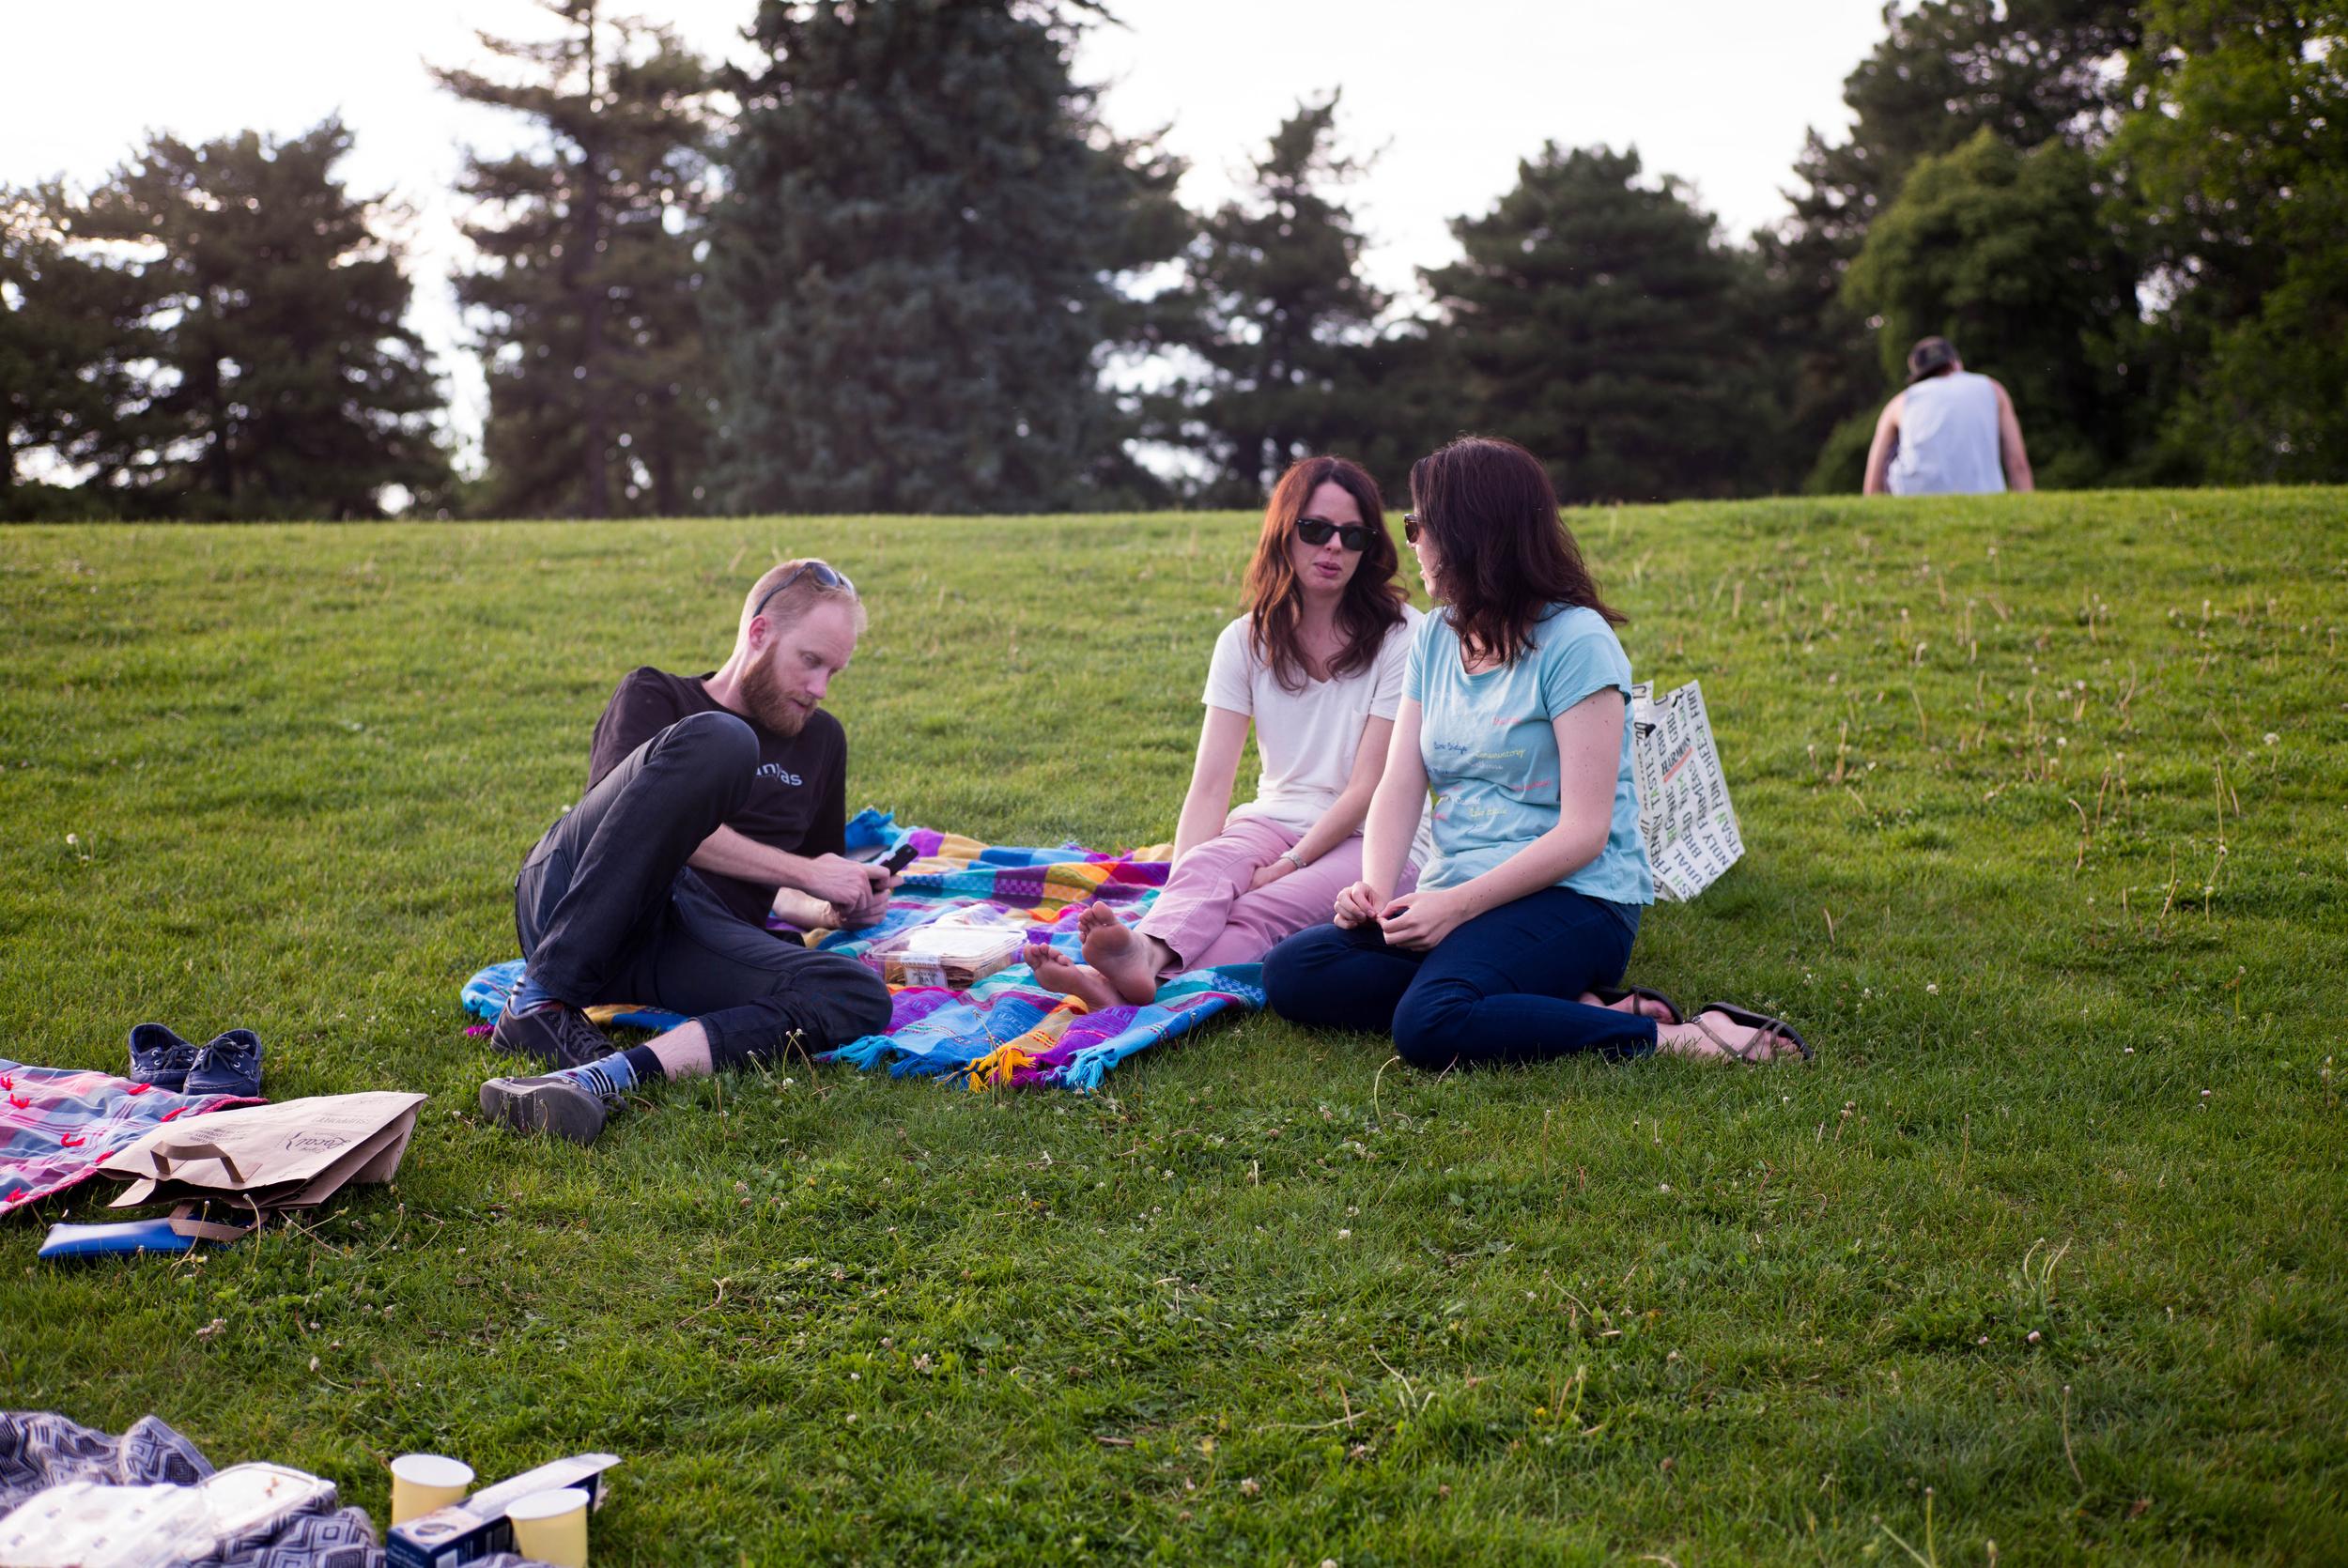 Dana, Sara and I ventured over the hill...